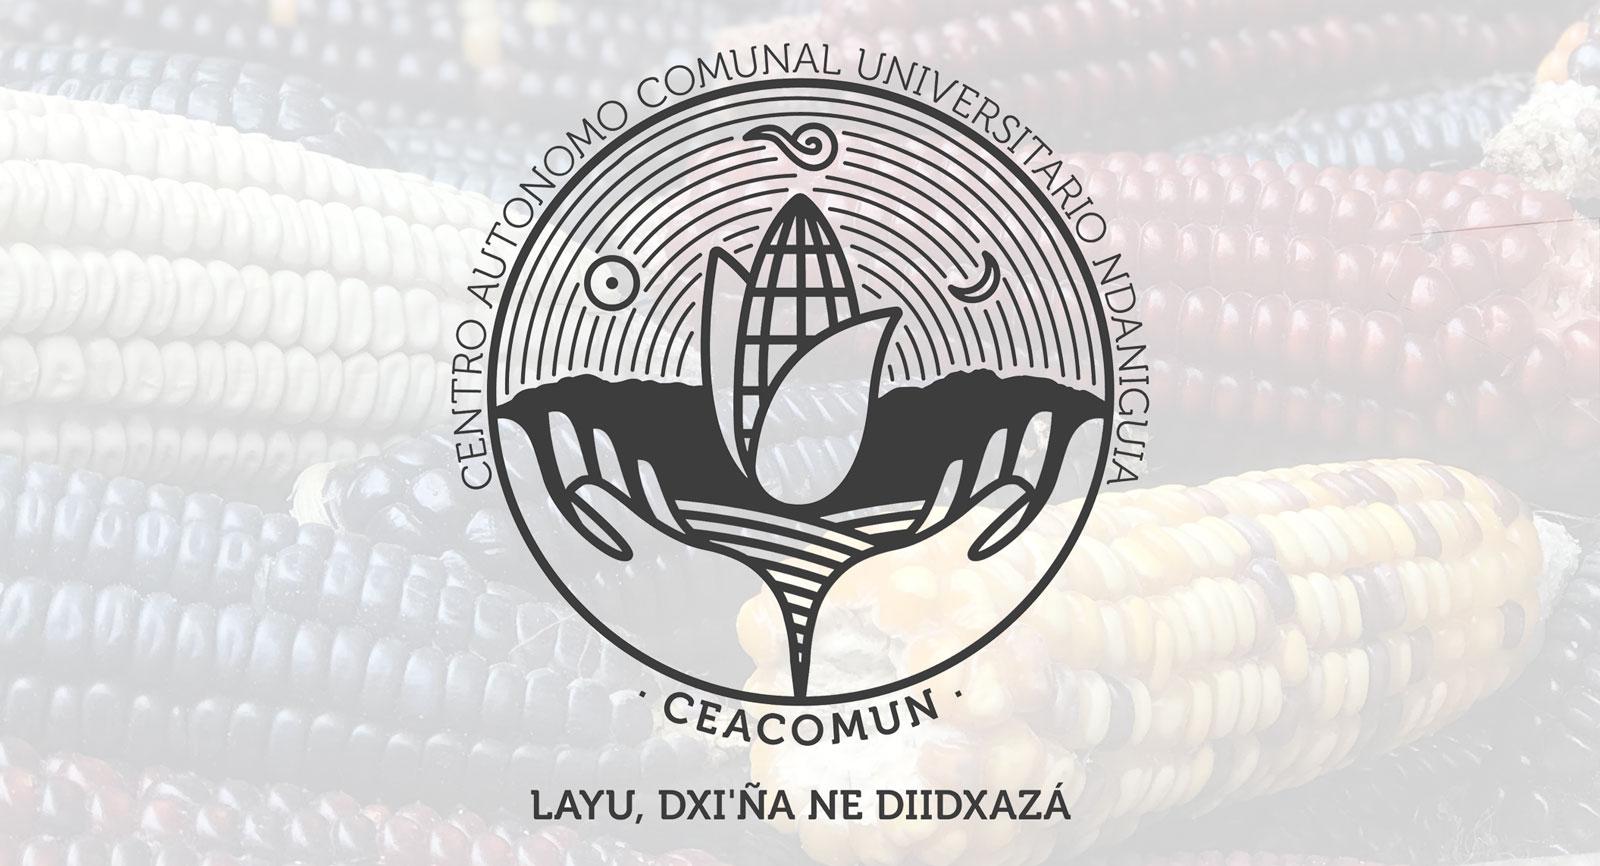 centro-autonomo-comunal-universitario